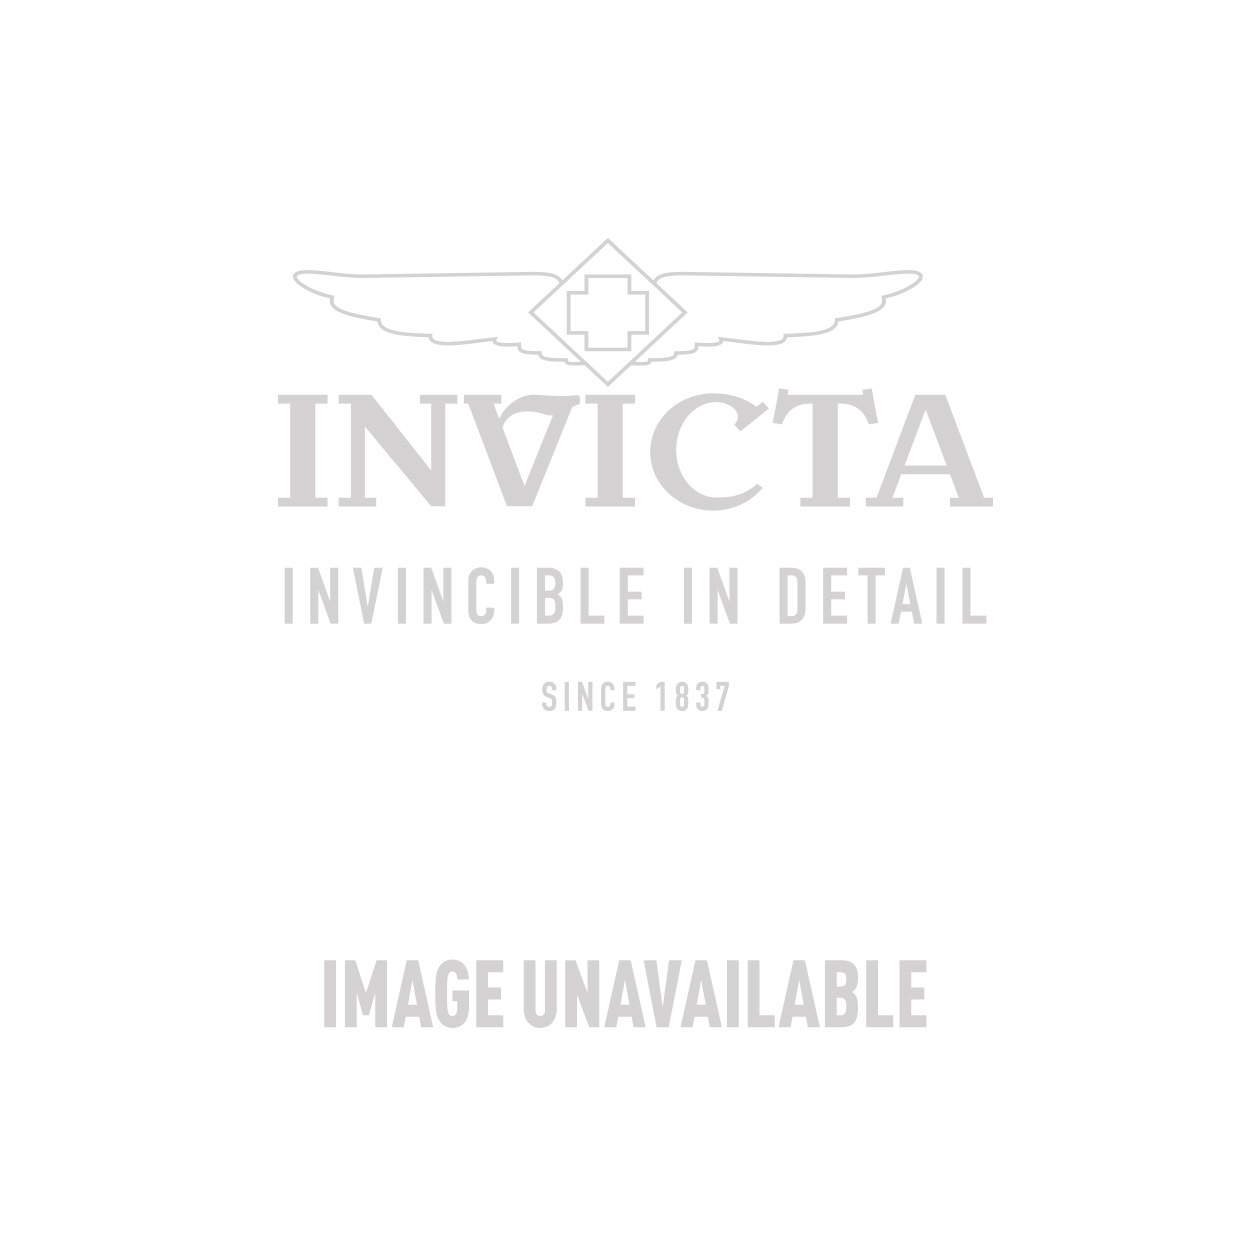 Men Watches - Invicta Reserve Quartz Watch - Model 12728 - Invicta Stores